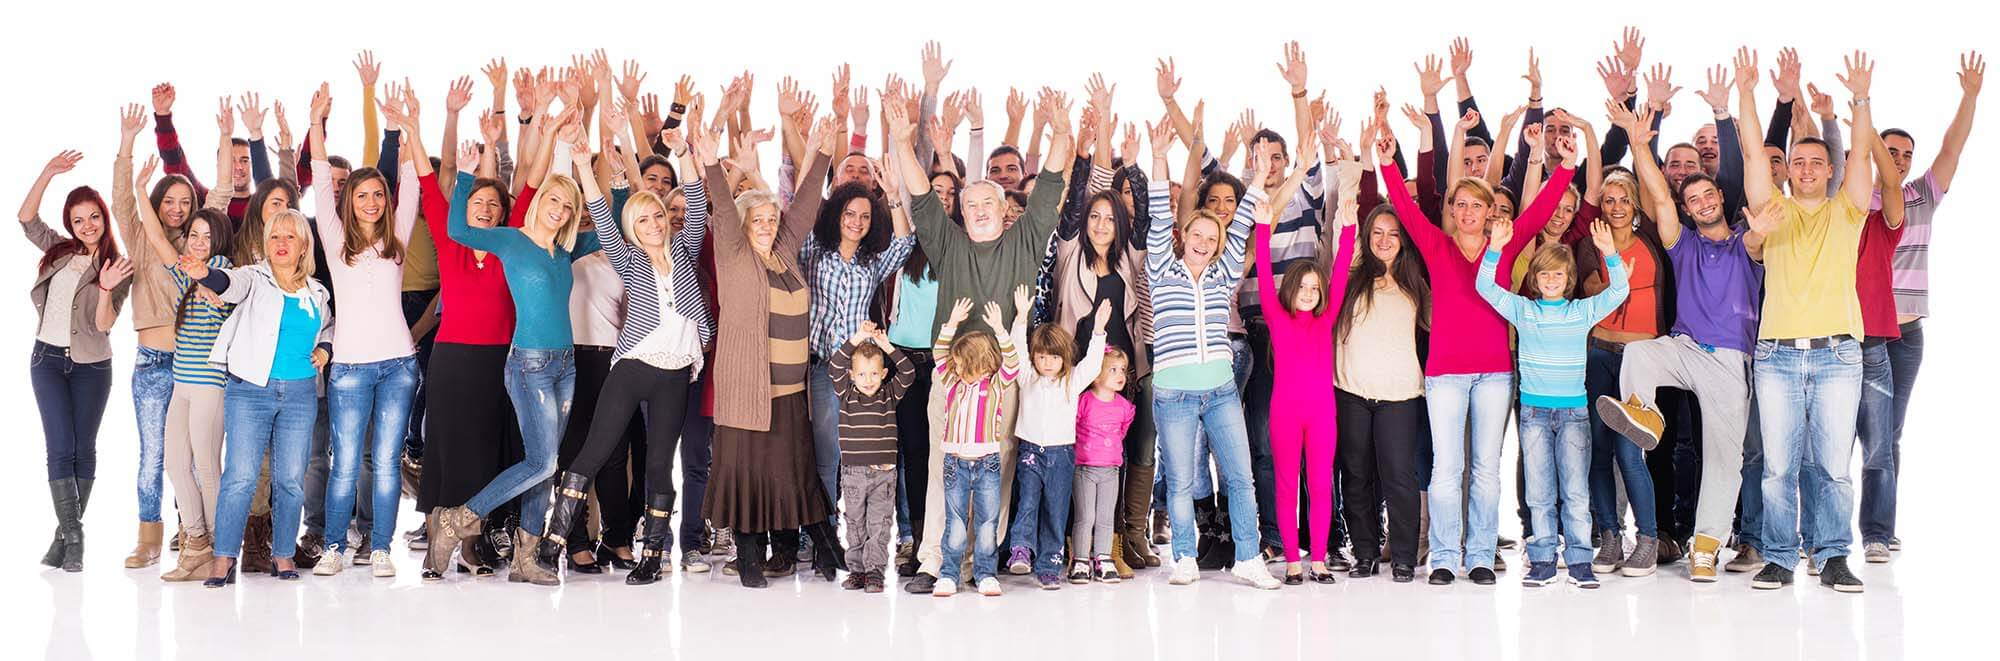 crowd hands raised